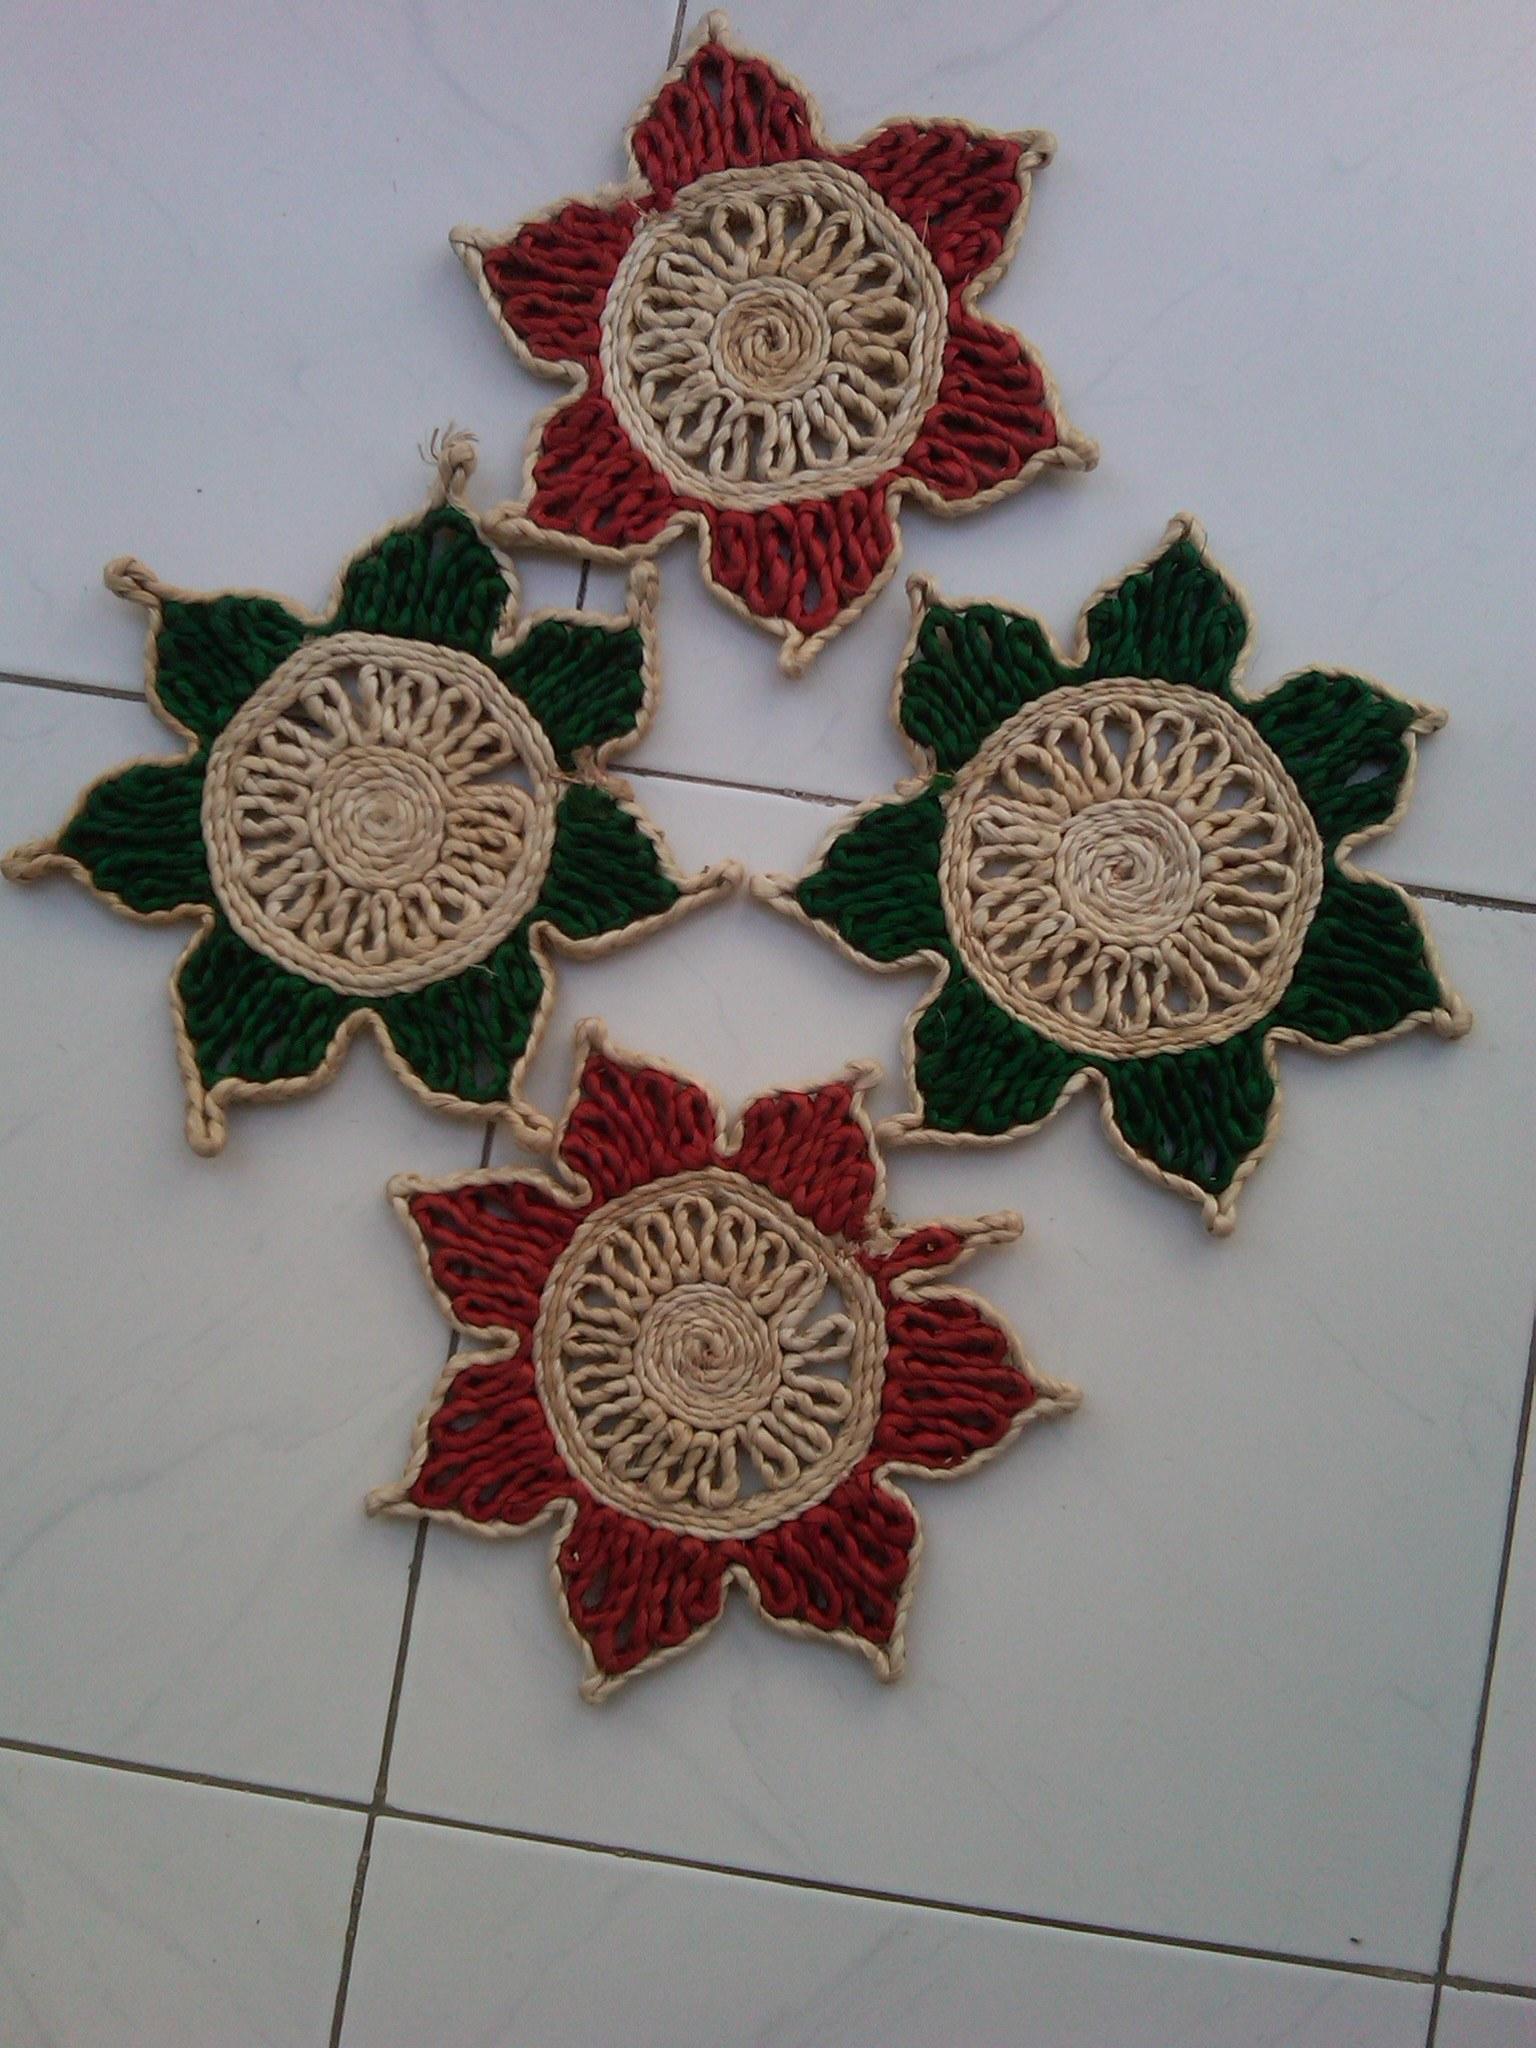 Indian Premium Jute Authentic Coasters Online Shopping